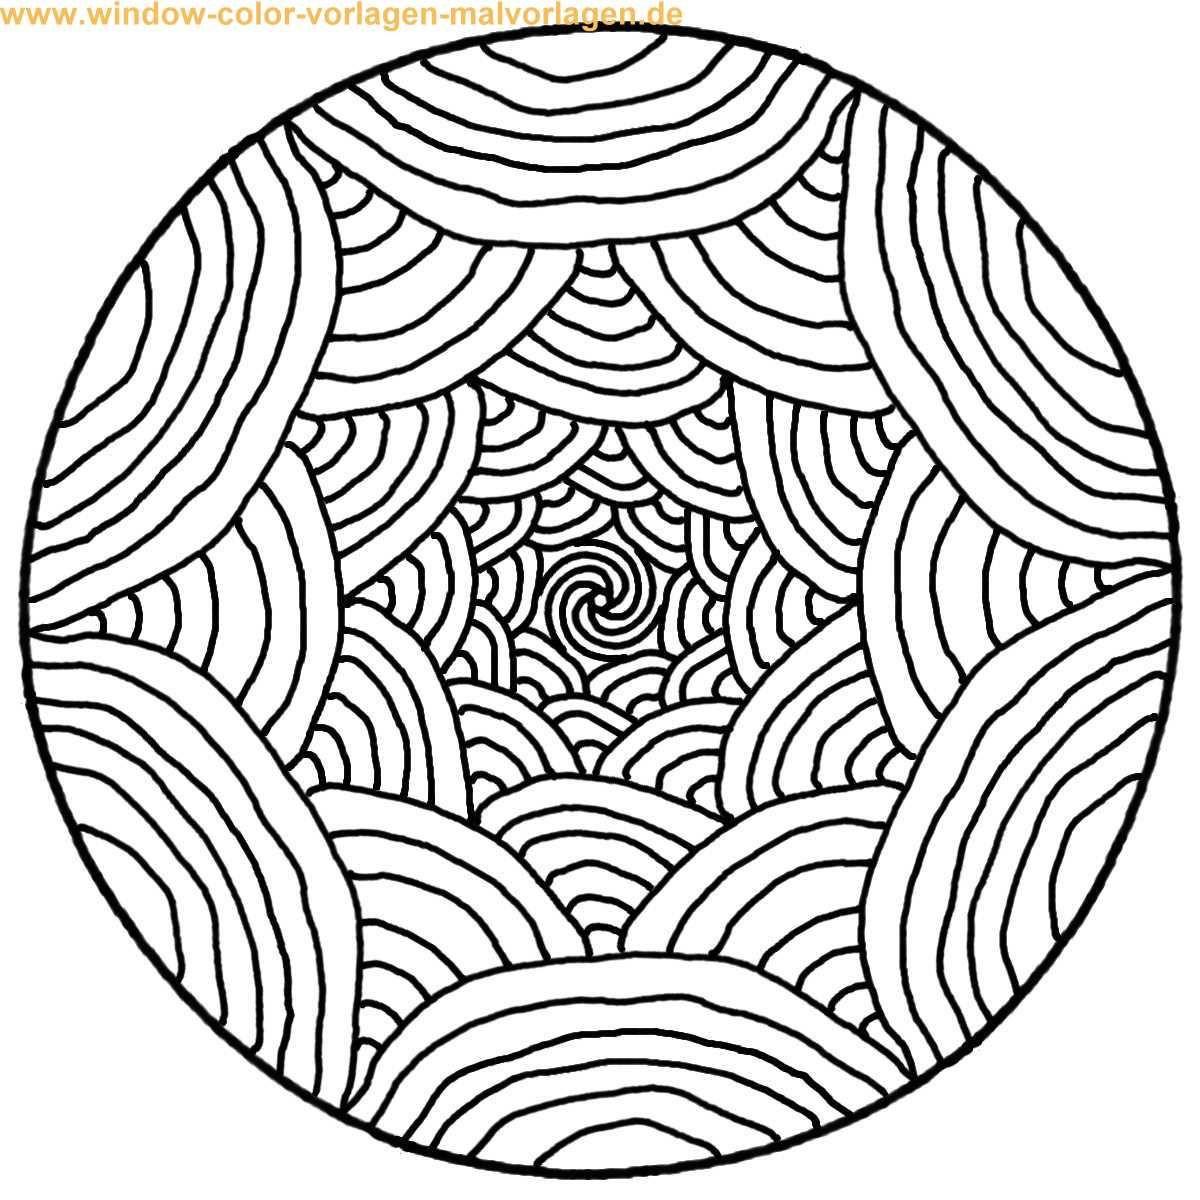 Mandala Herbst Zum Ausdrucken Genial Mandalas to Print and Color Malvorlage Ausmalbild Fotos